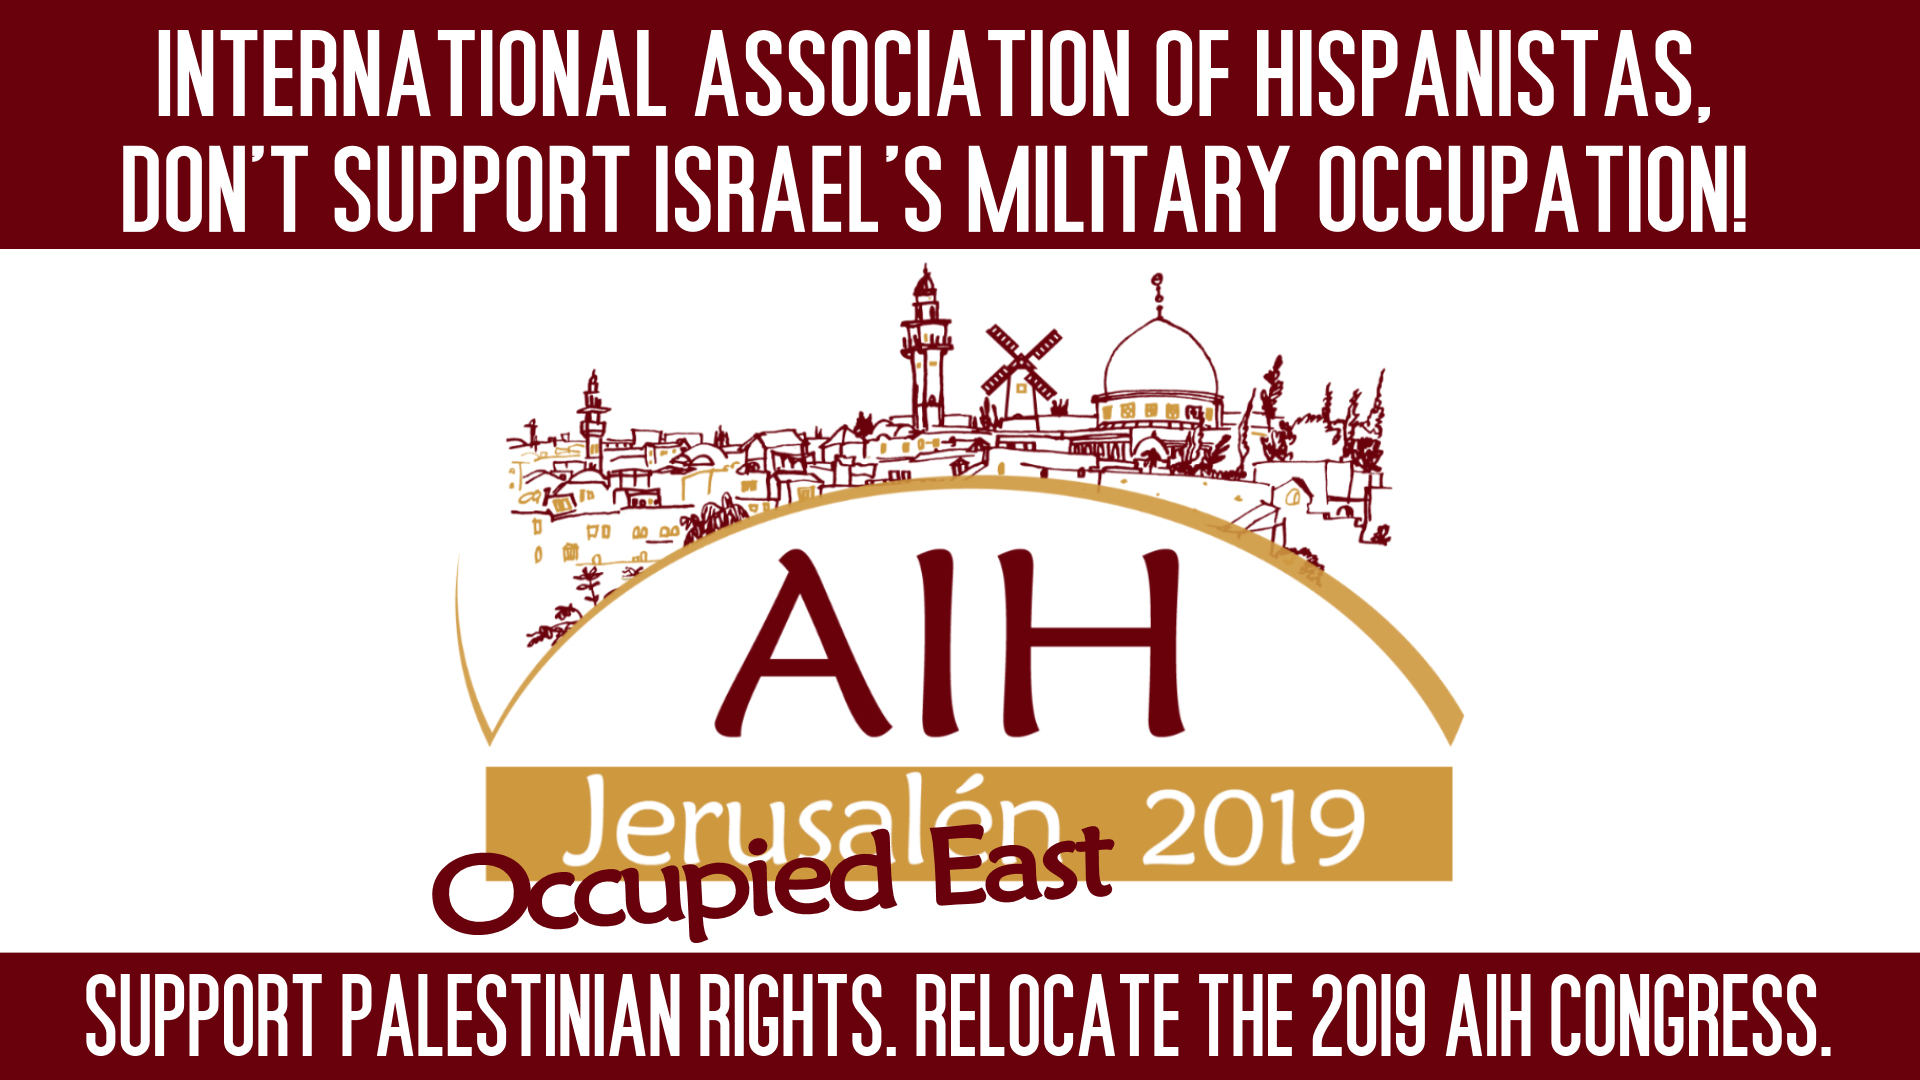 Palestinian Professors' Unions Urge International Hispanistas Association to Move Congress From Hebrew University